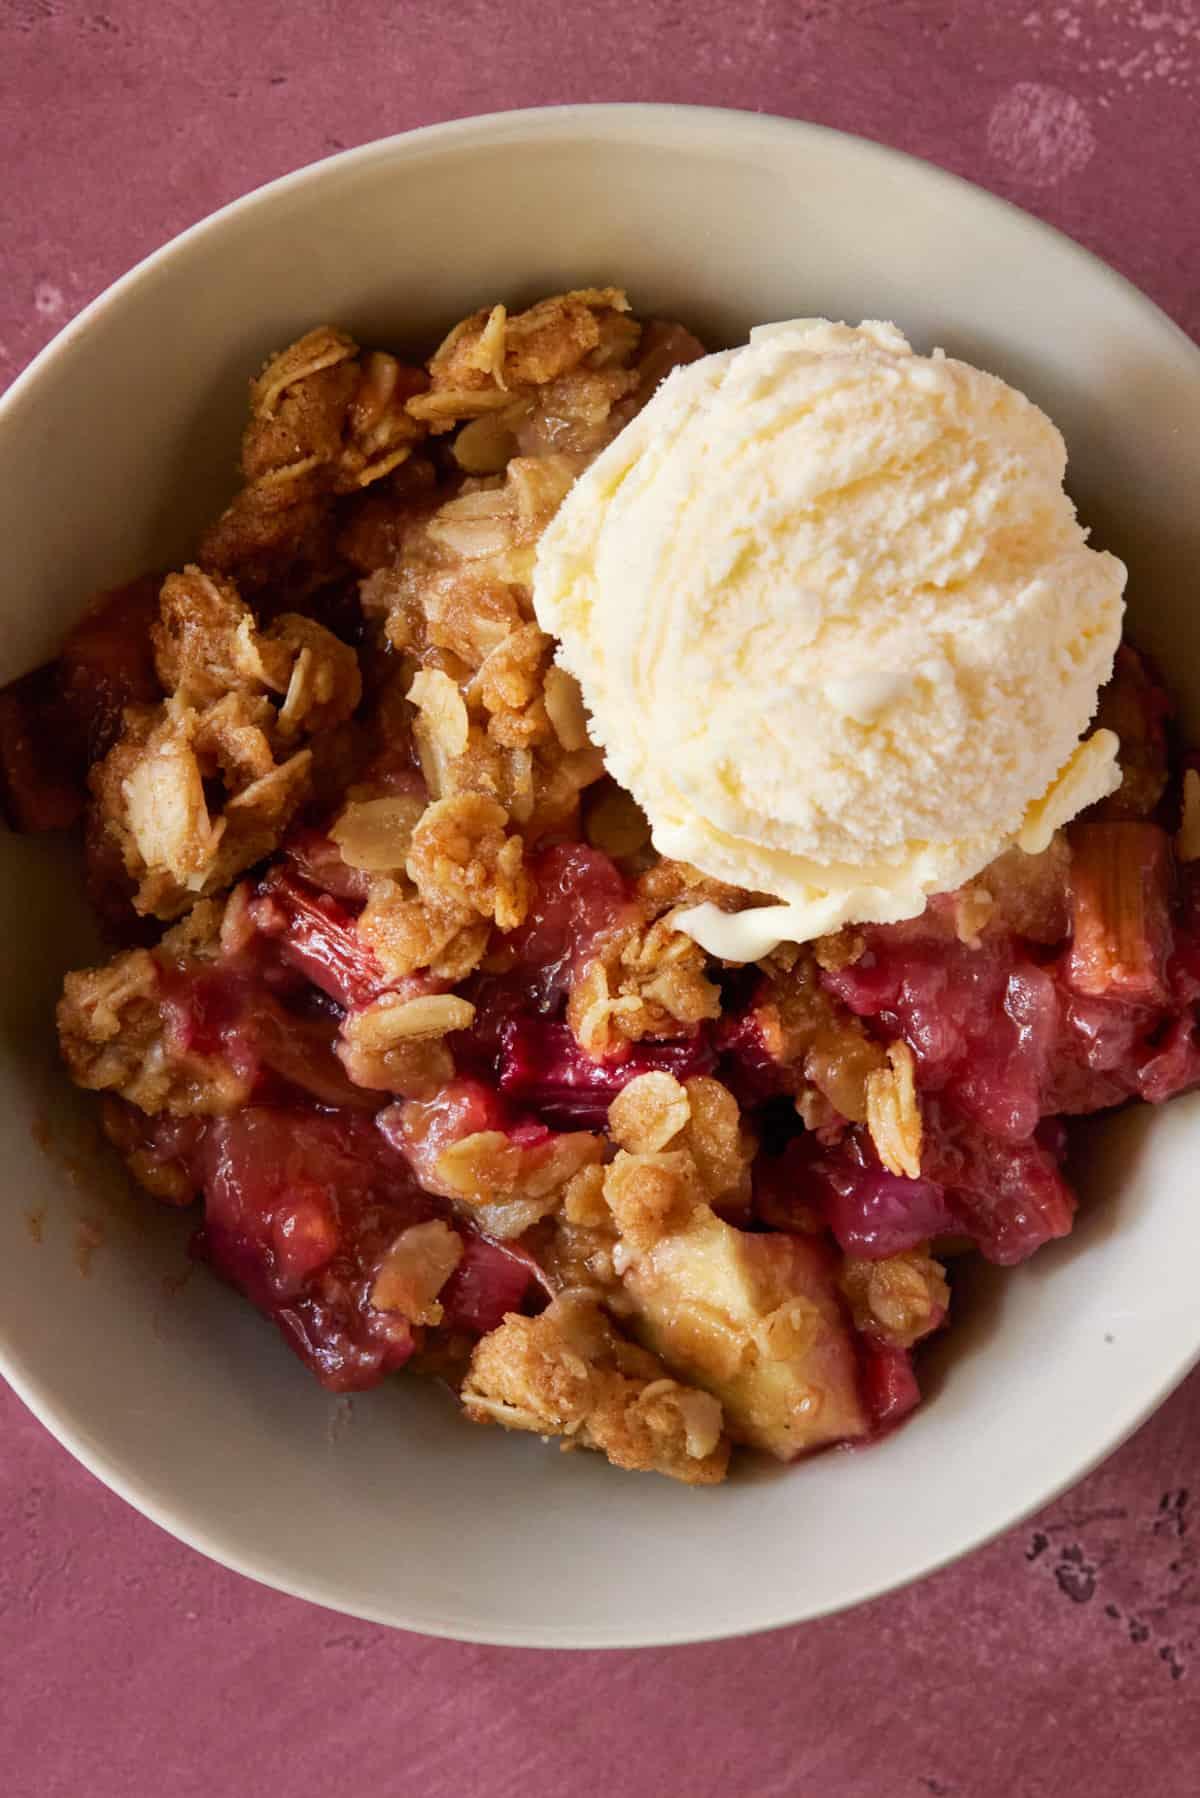 Bowl of fruit crisp with ice cream.